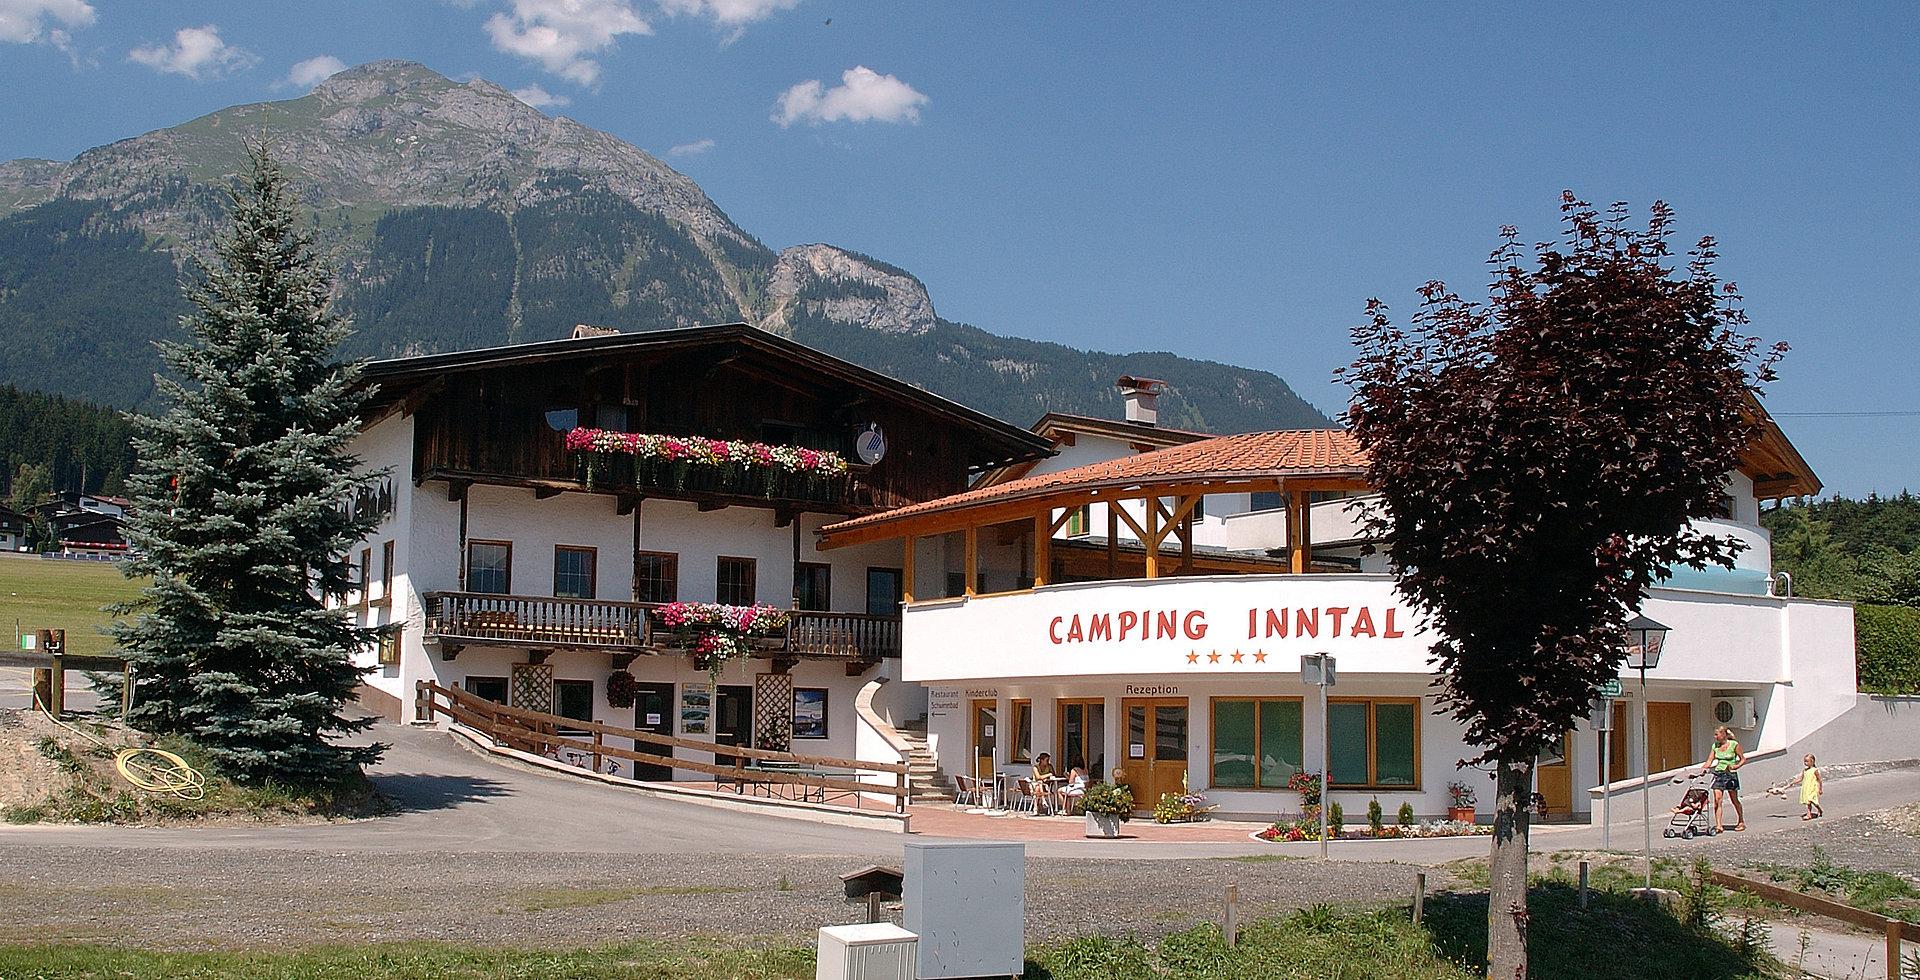 Rezeptionsgebäude Camping Inntal